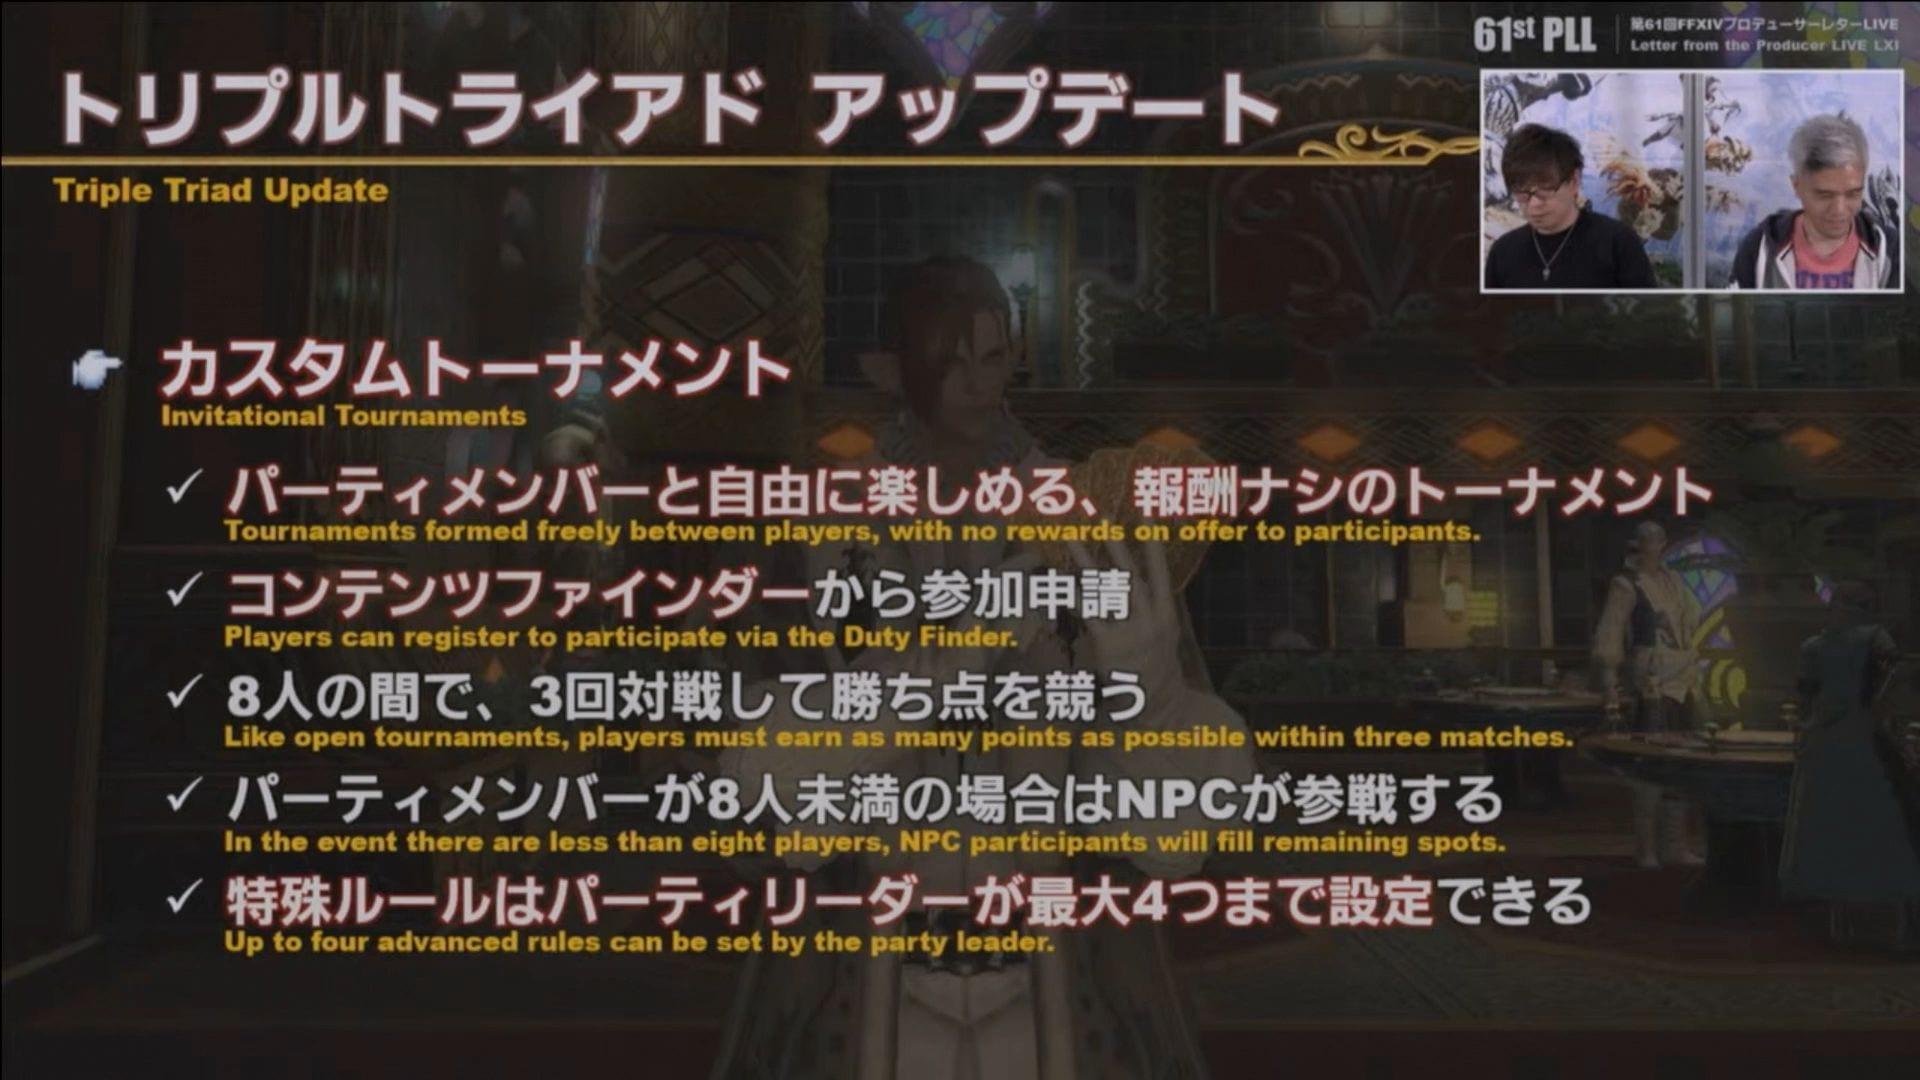 Final-Fantasy-XIV-Screenshot-2020-11-27-14-01-26.jpg?ssl=1